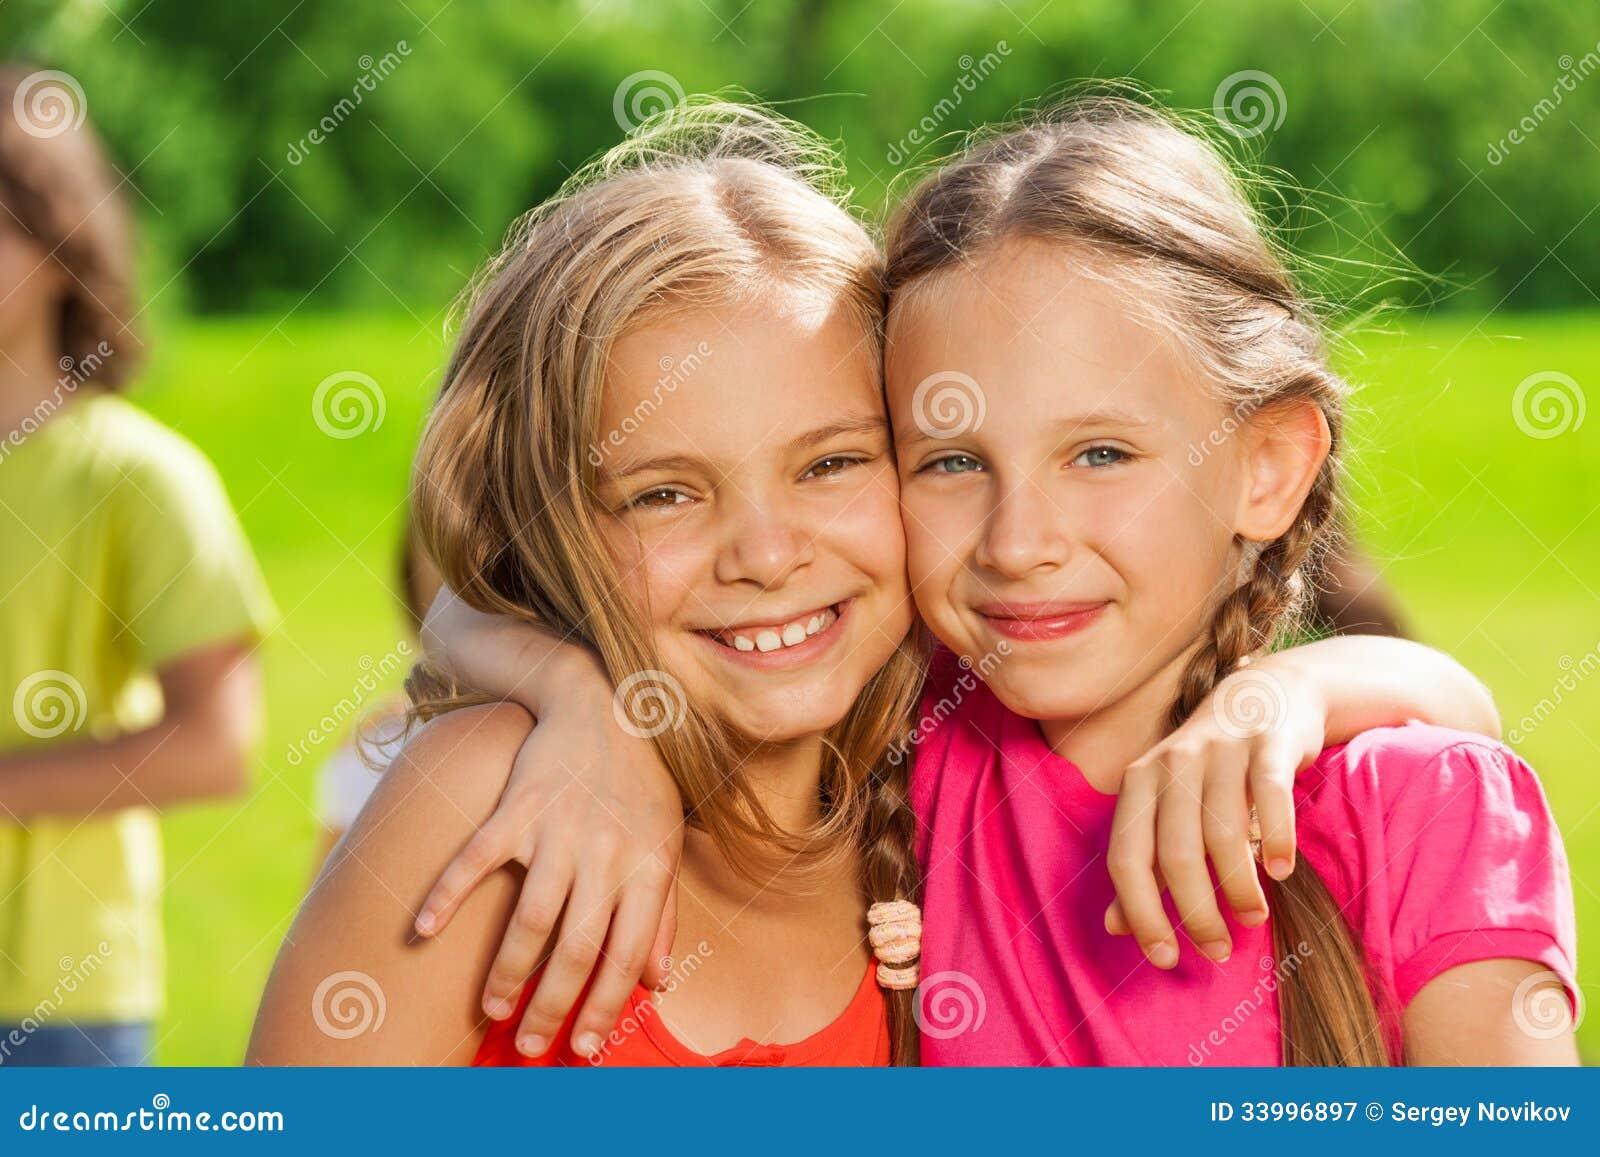 Two happy girls hugging